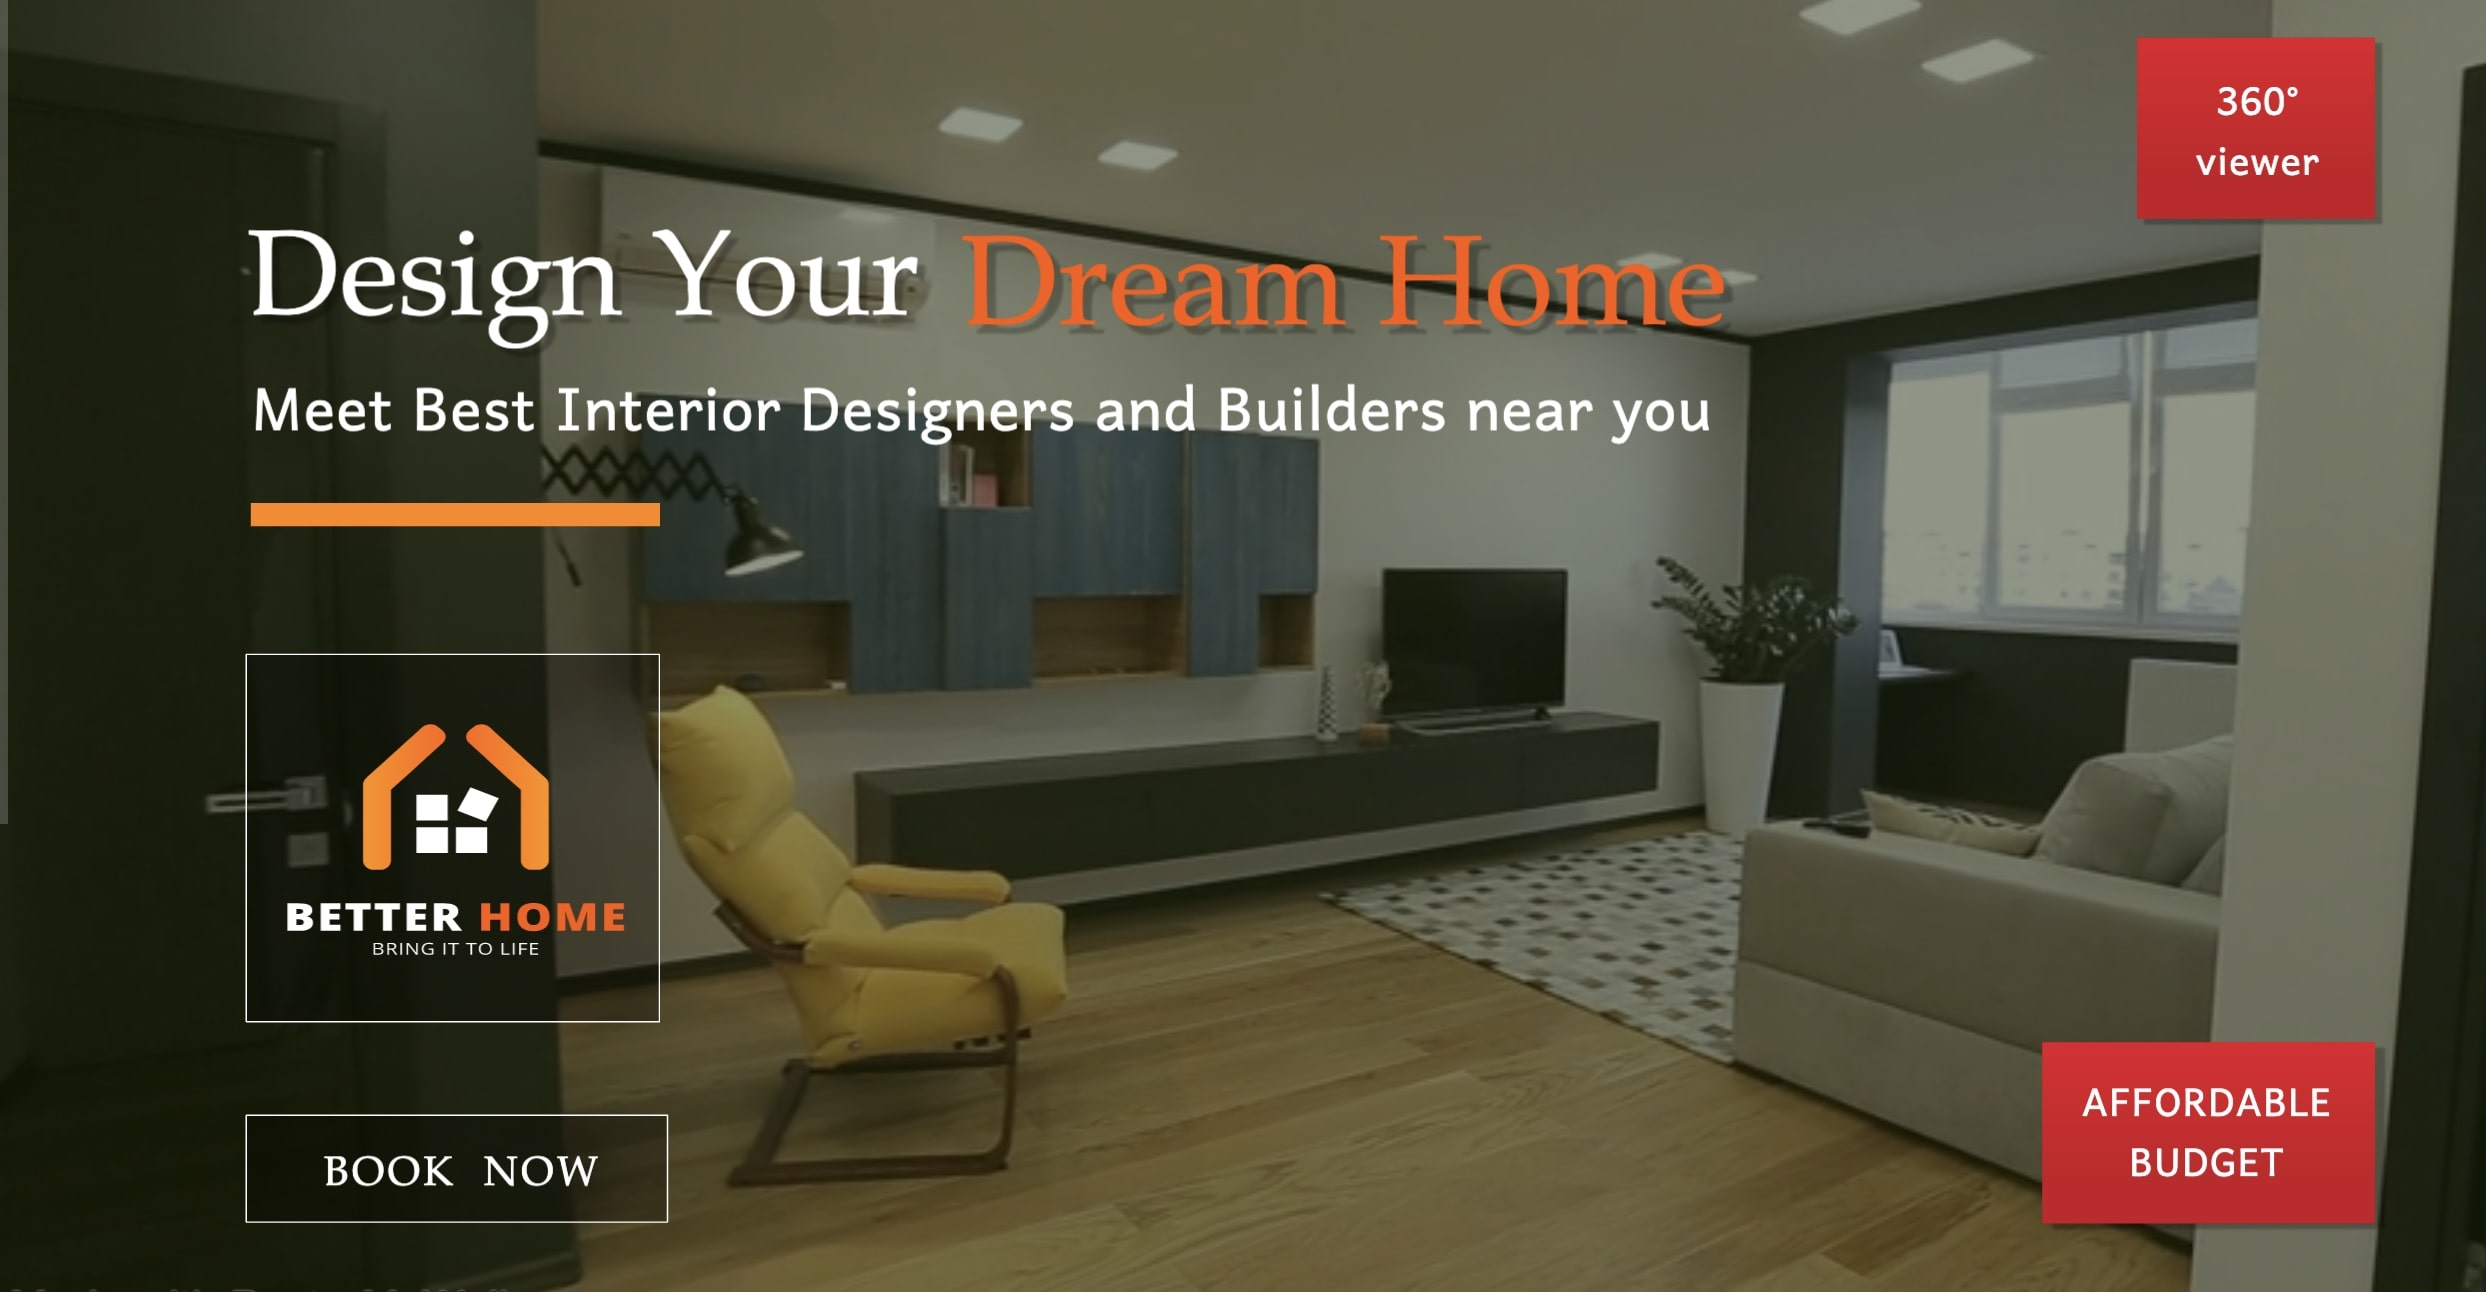 Inerior Designers Near You